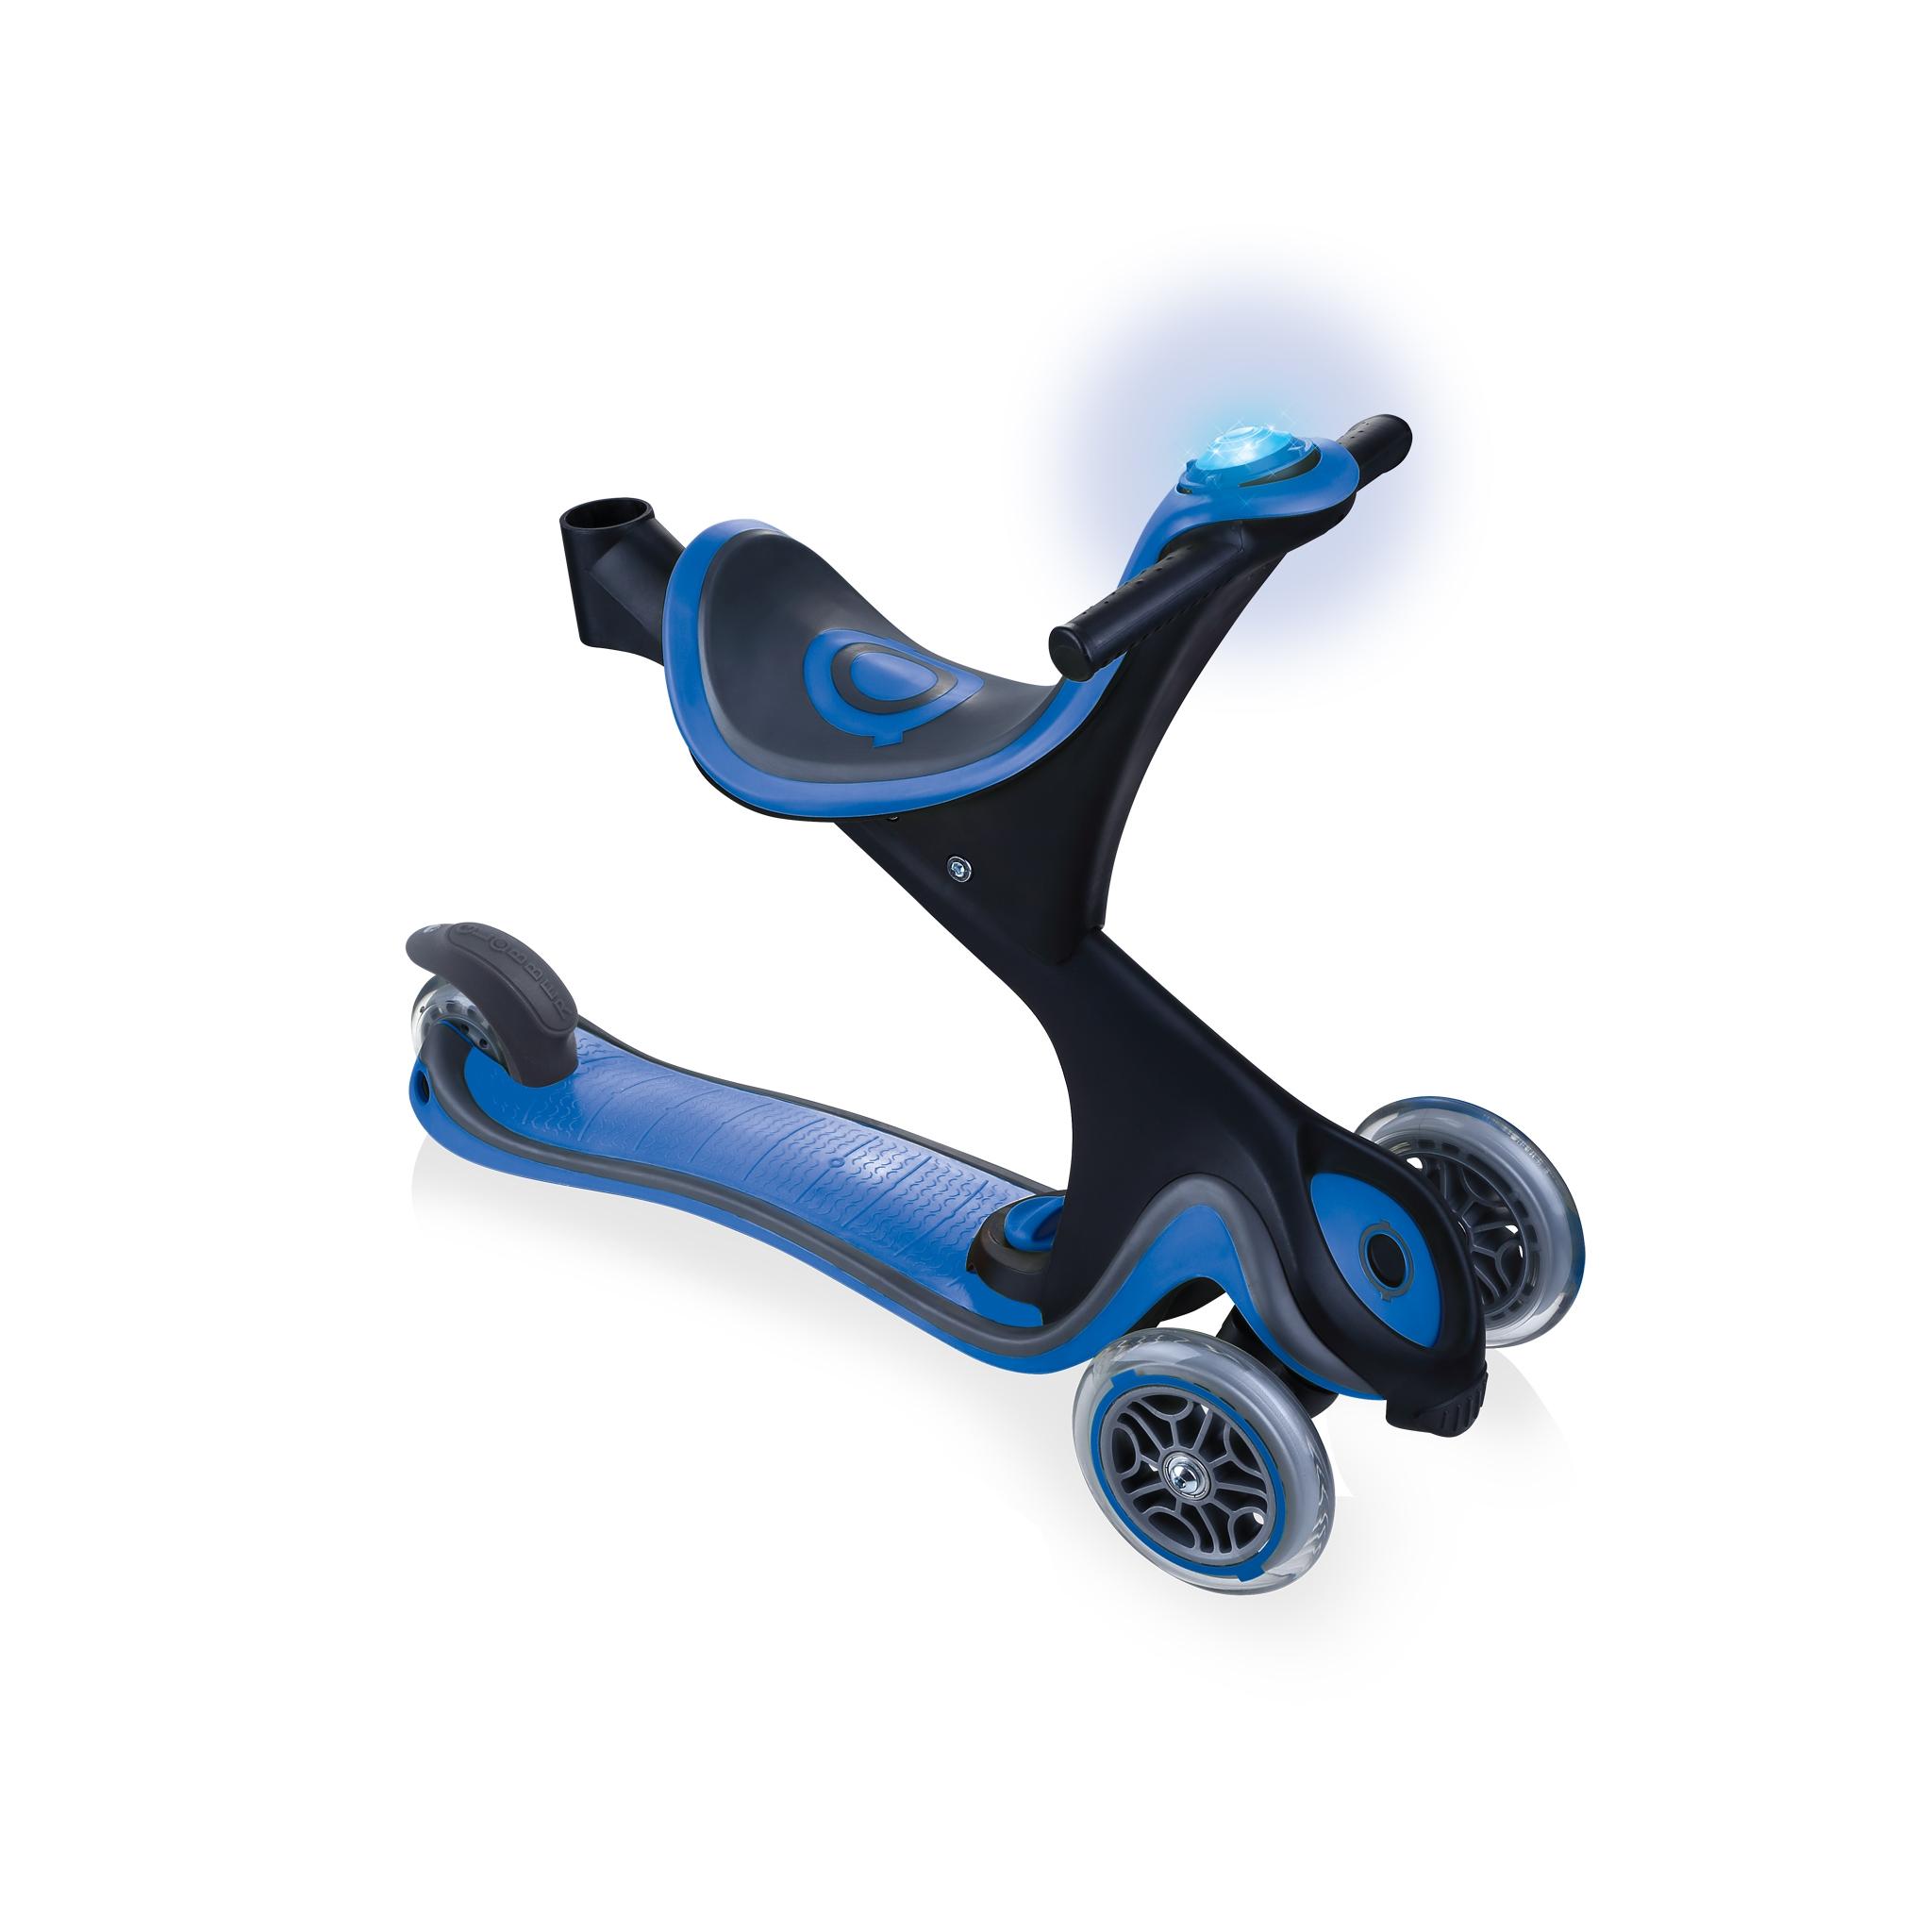 GO-UP-COMFORT-PLAY-walking-bike-mode_navy-blue